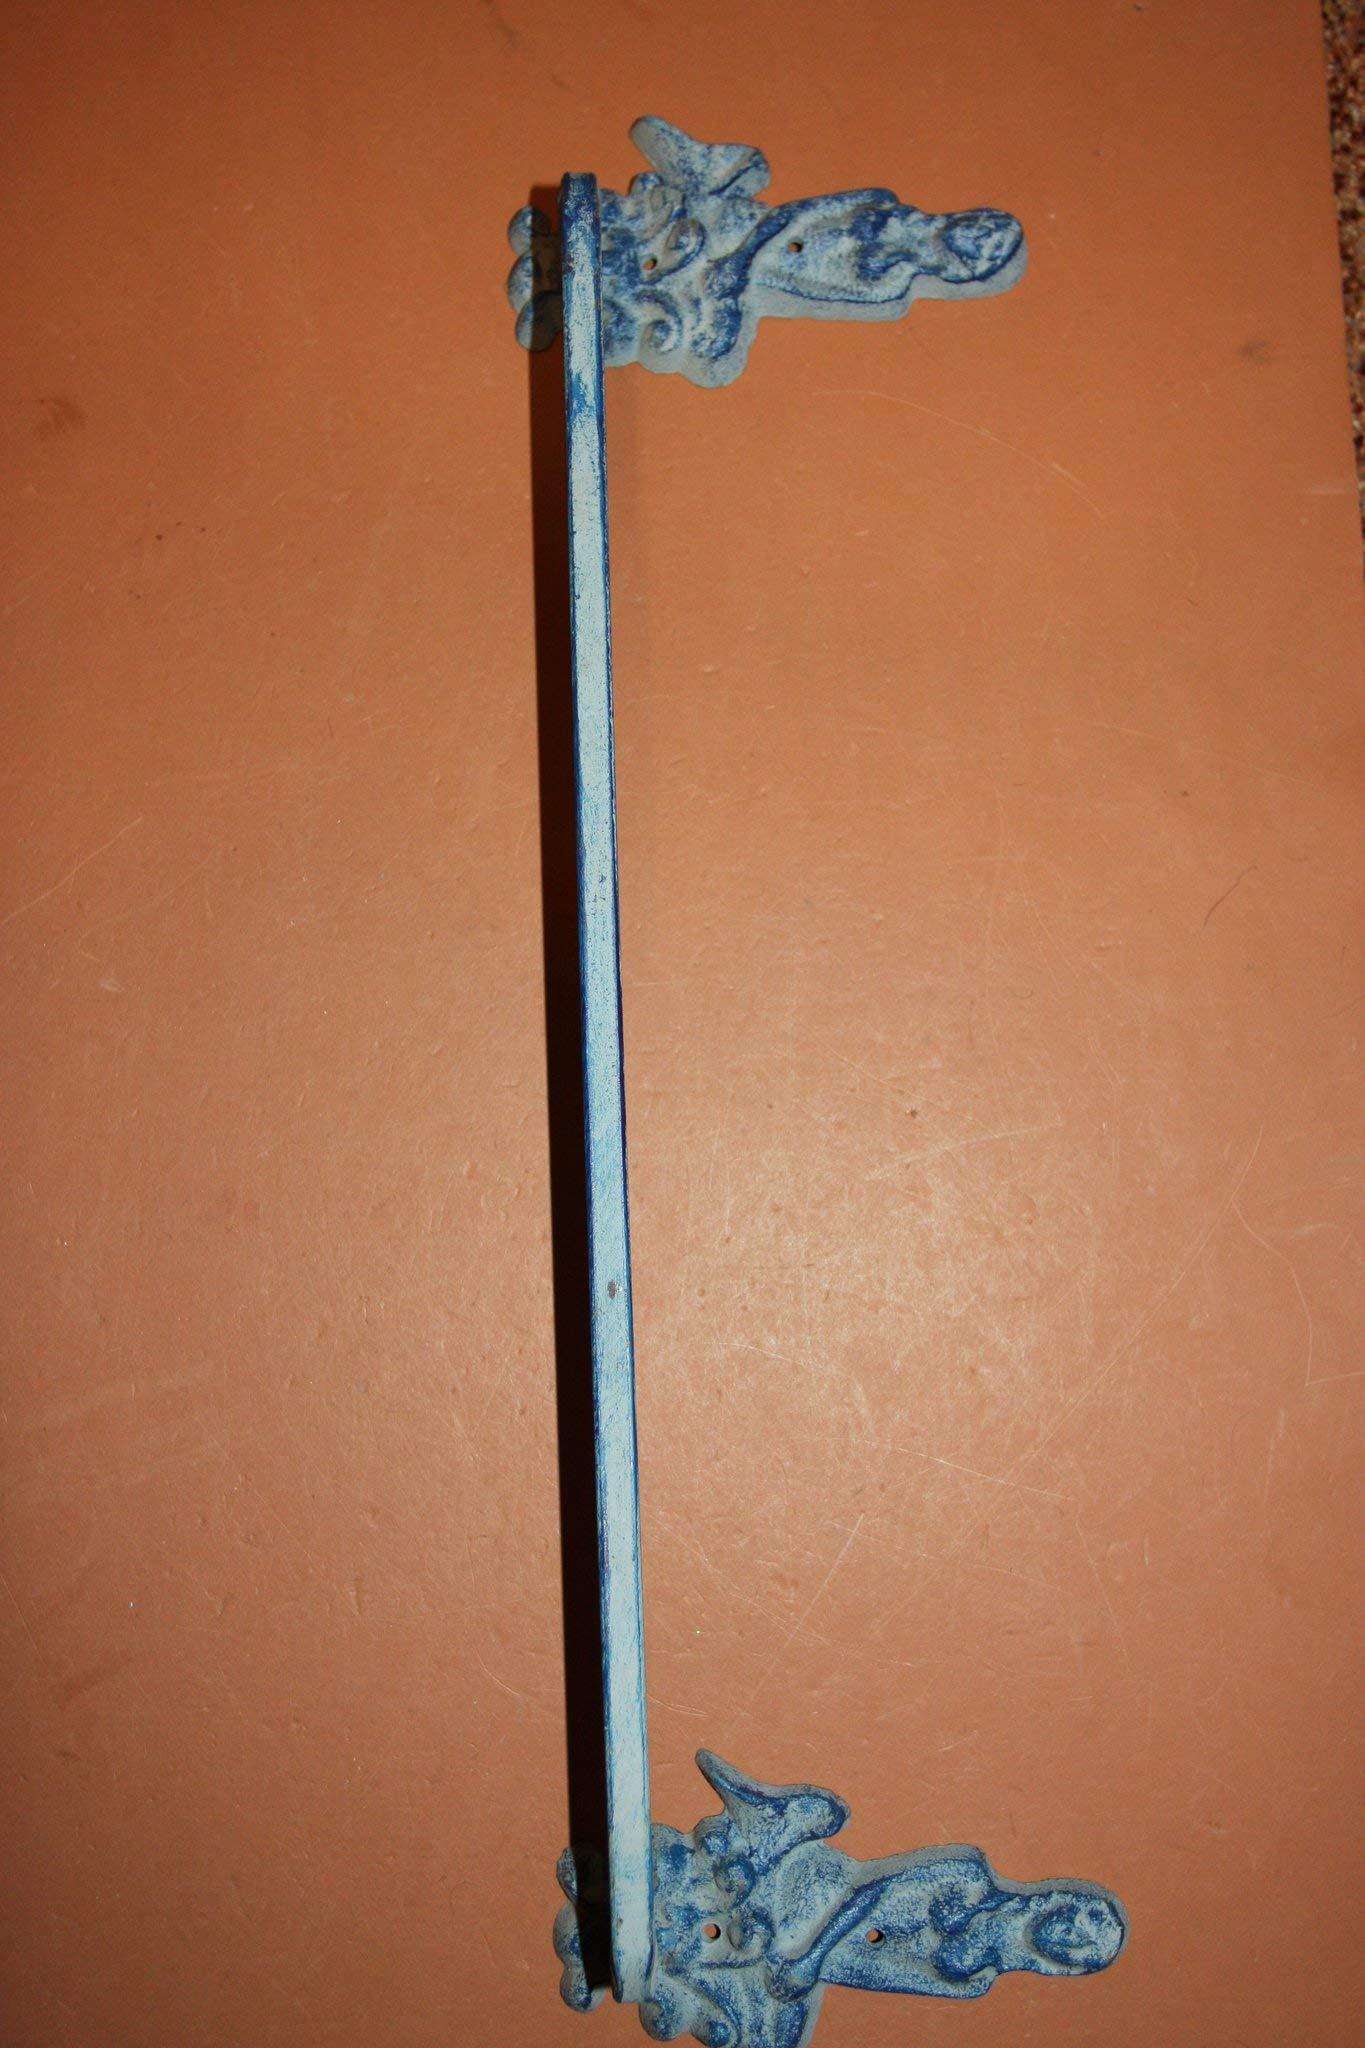 Southern Metal Mermaid Bath Towel Bar Wall Hooks Aqua Cast Iron Bundle 5 Pieces, MM by Southern Metal (Image #2)